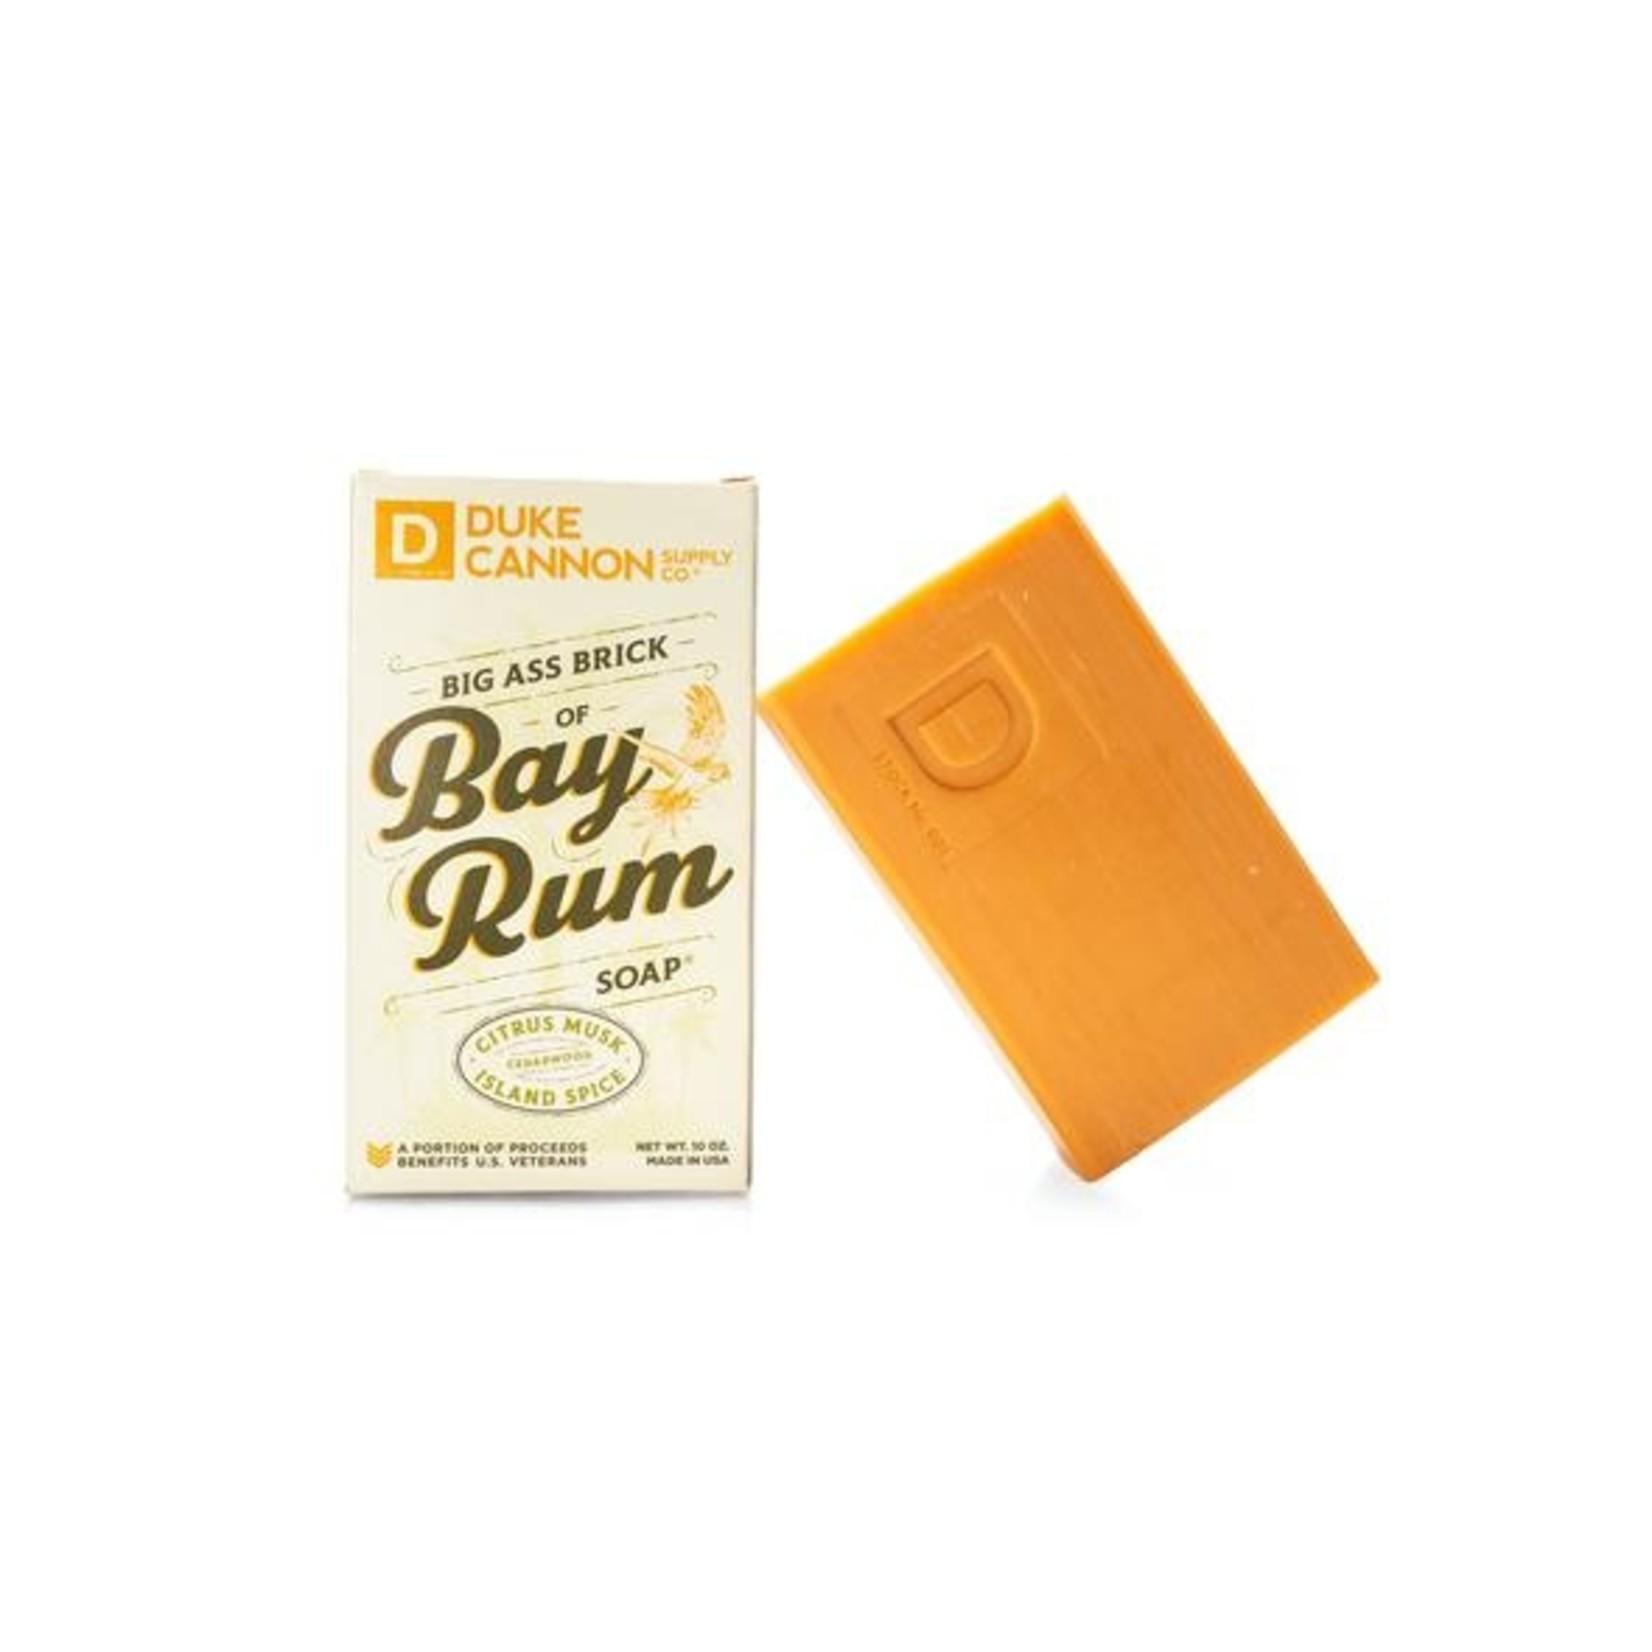 Duke Cannon Supply Co. Duke Cannon Bay Rum Soap